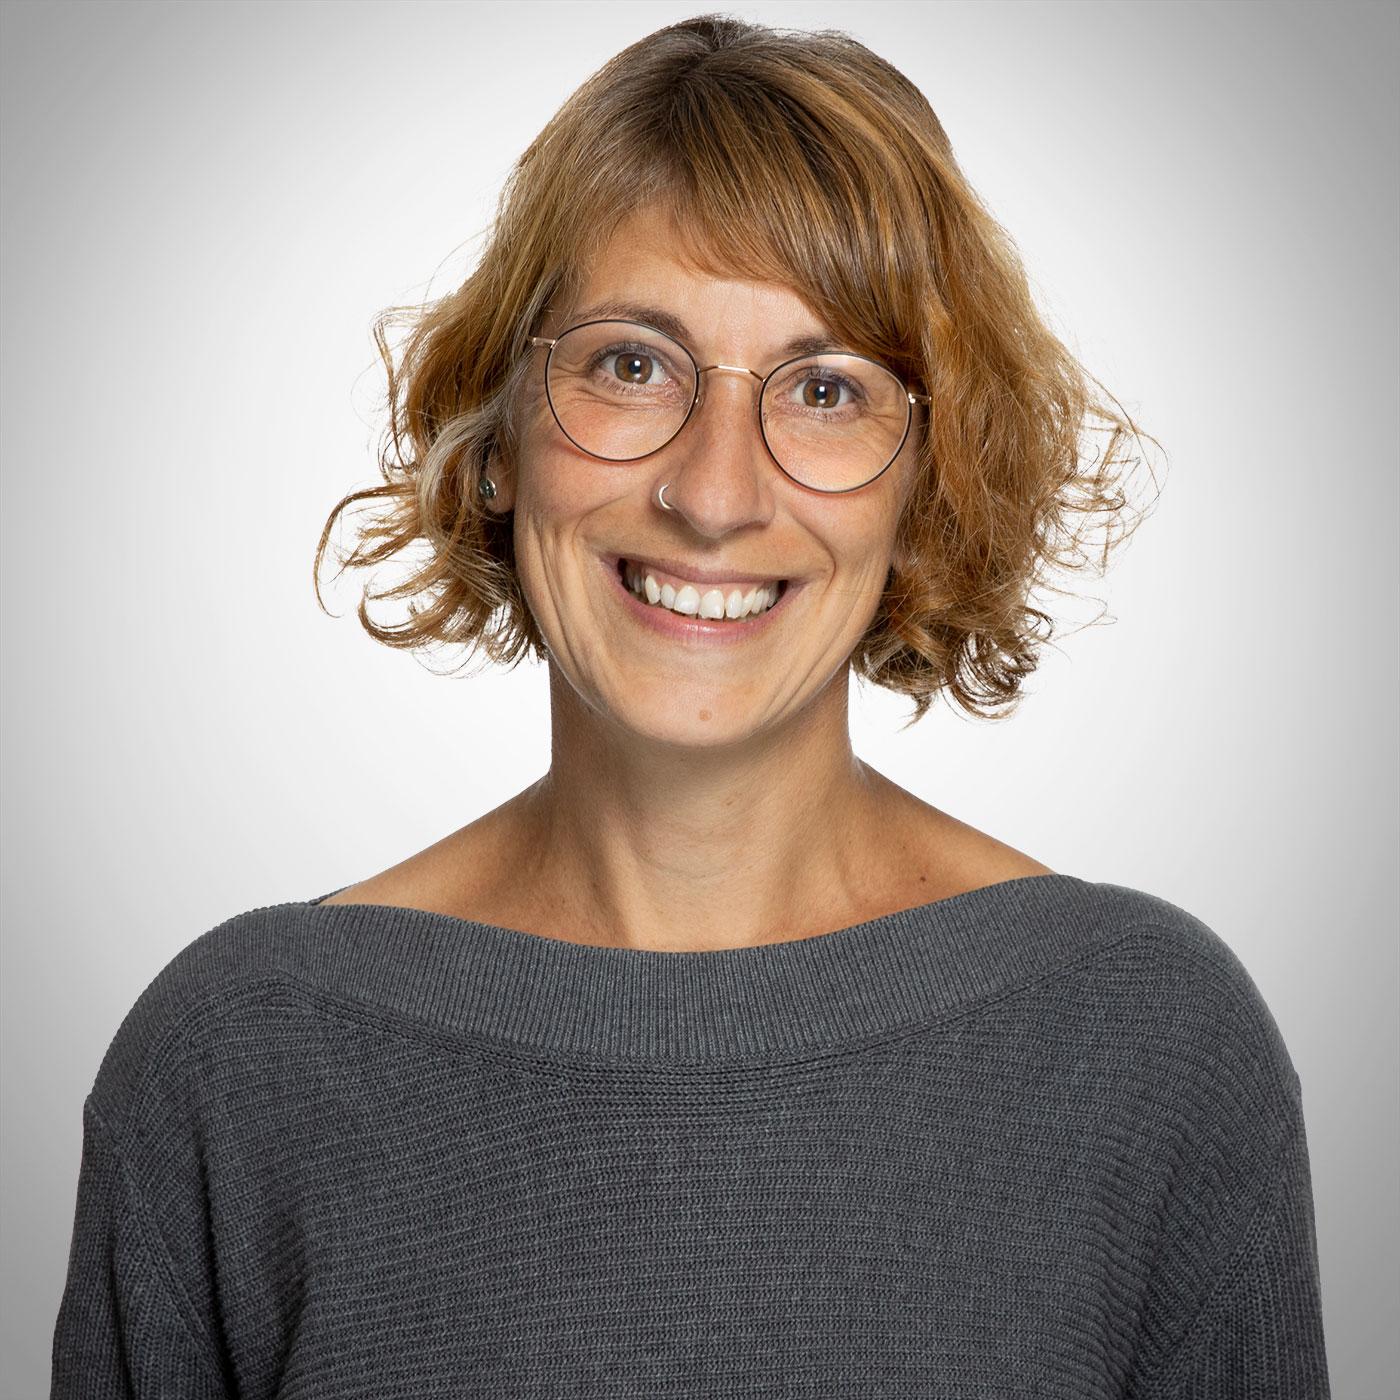 Silke Wiesner